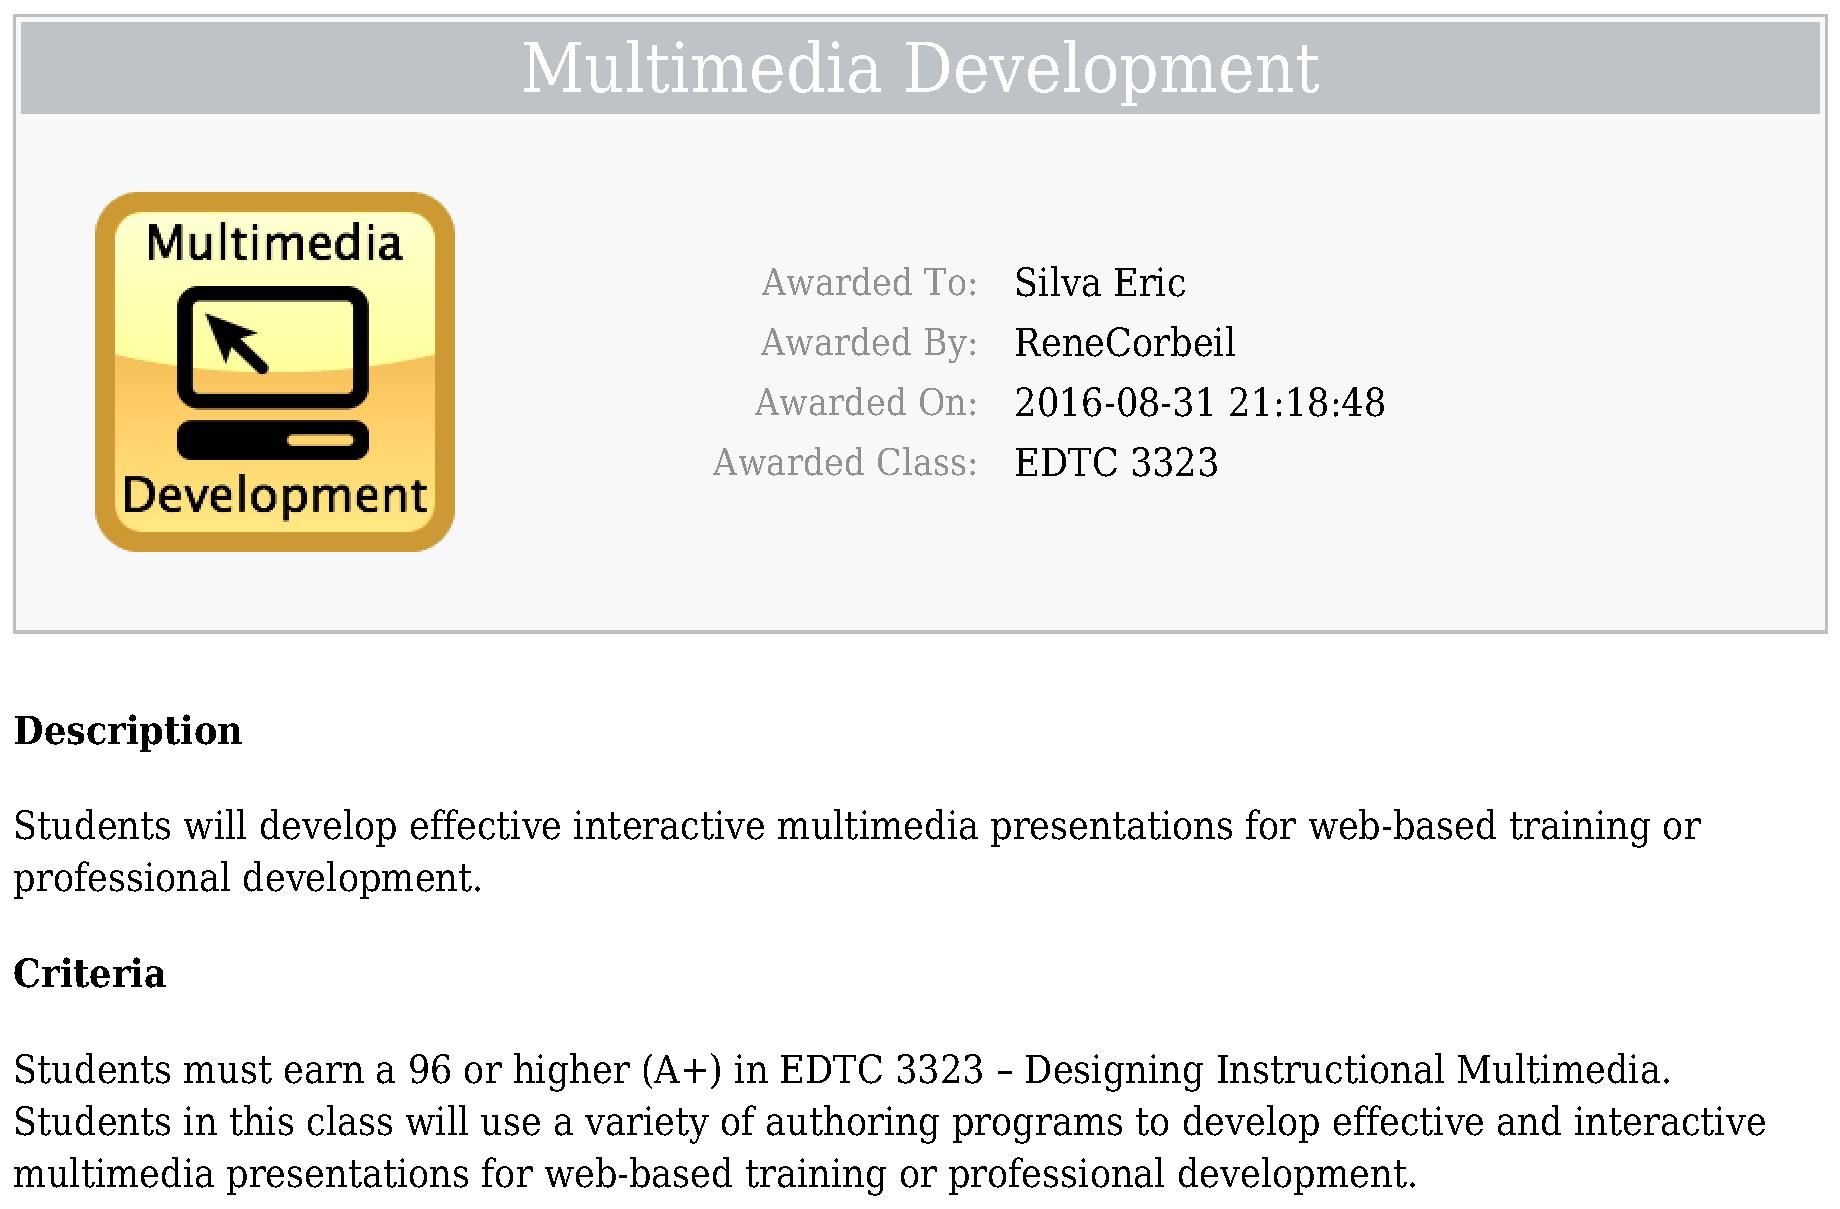 multimedia-development